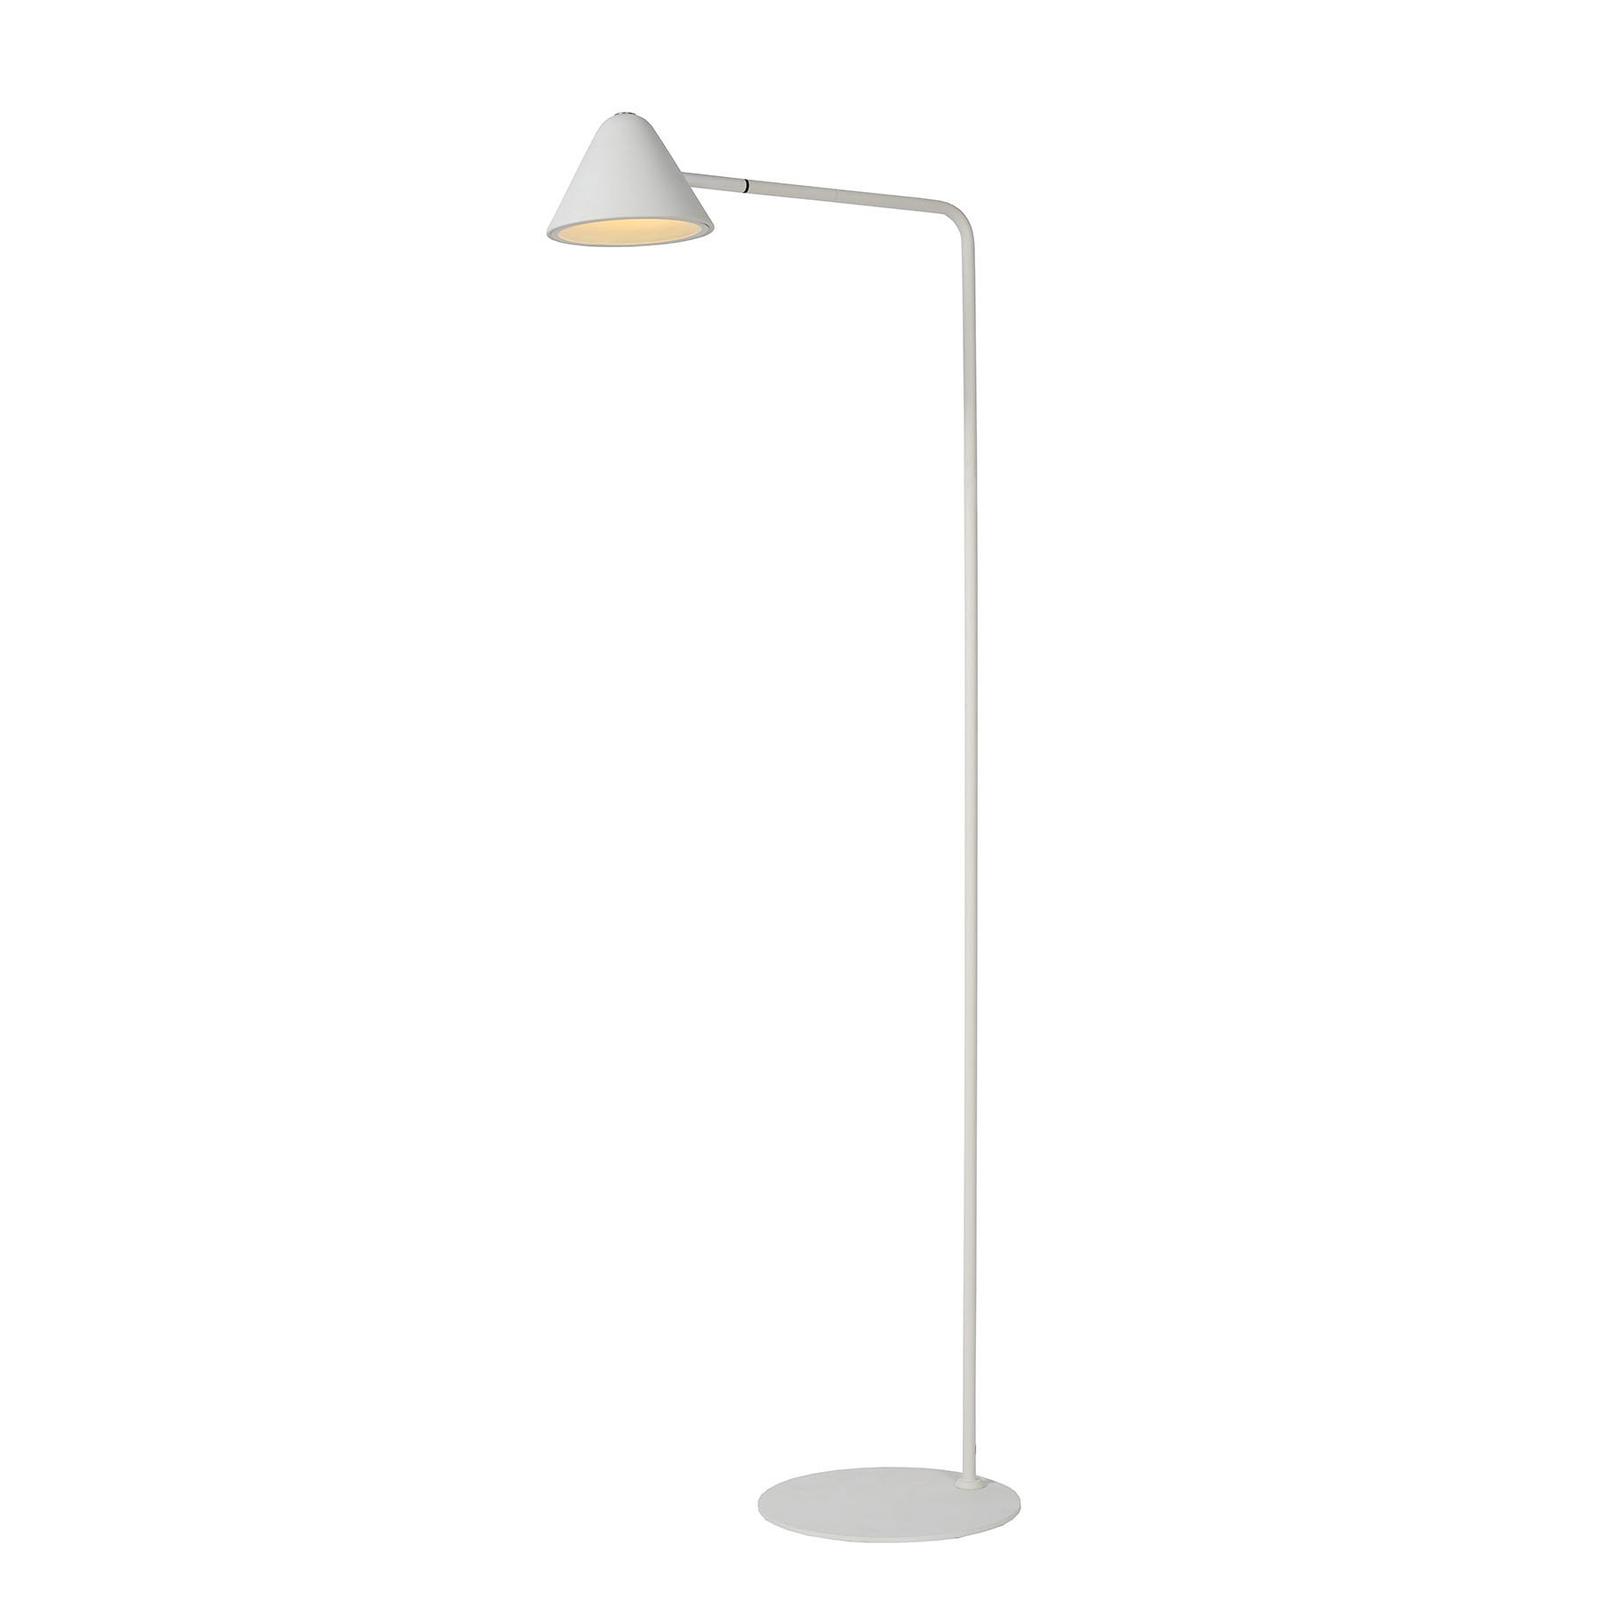 Devon LED-gulvlampe i metal, hvid